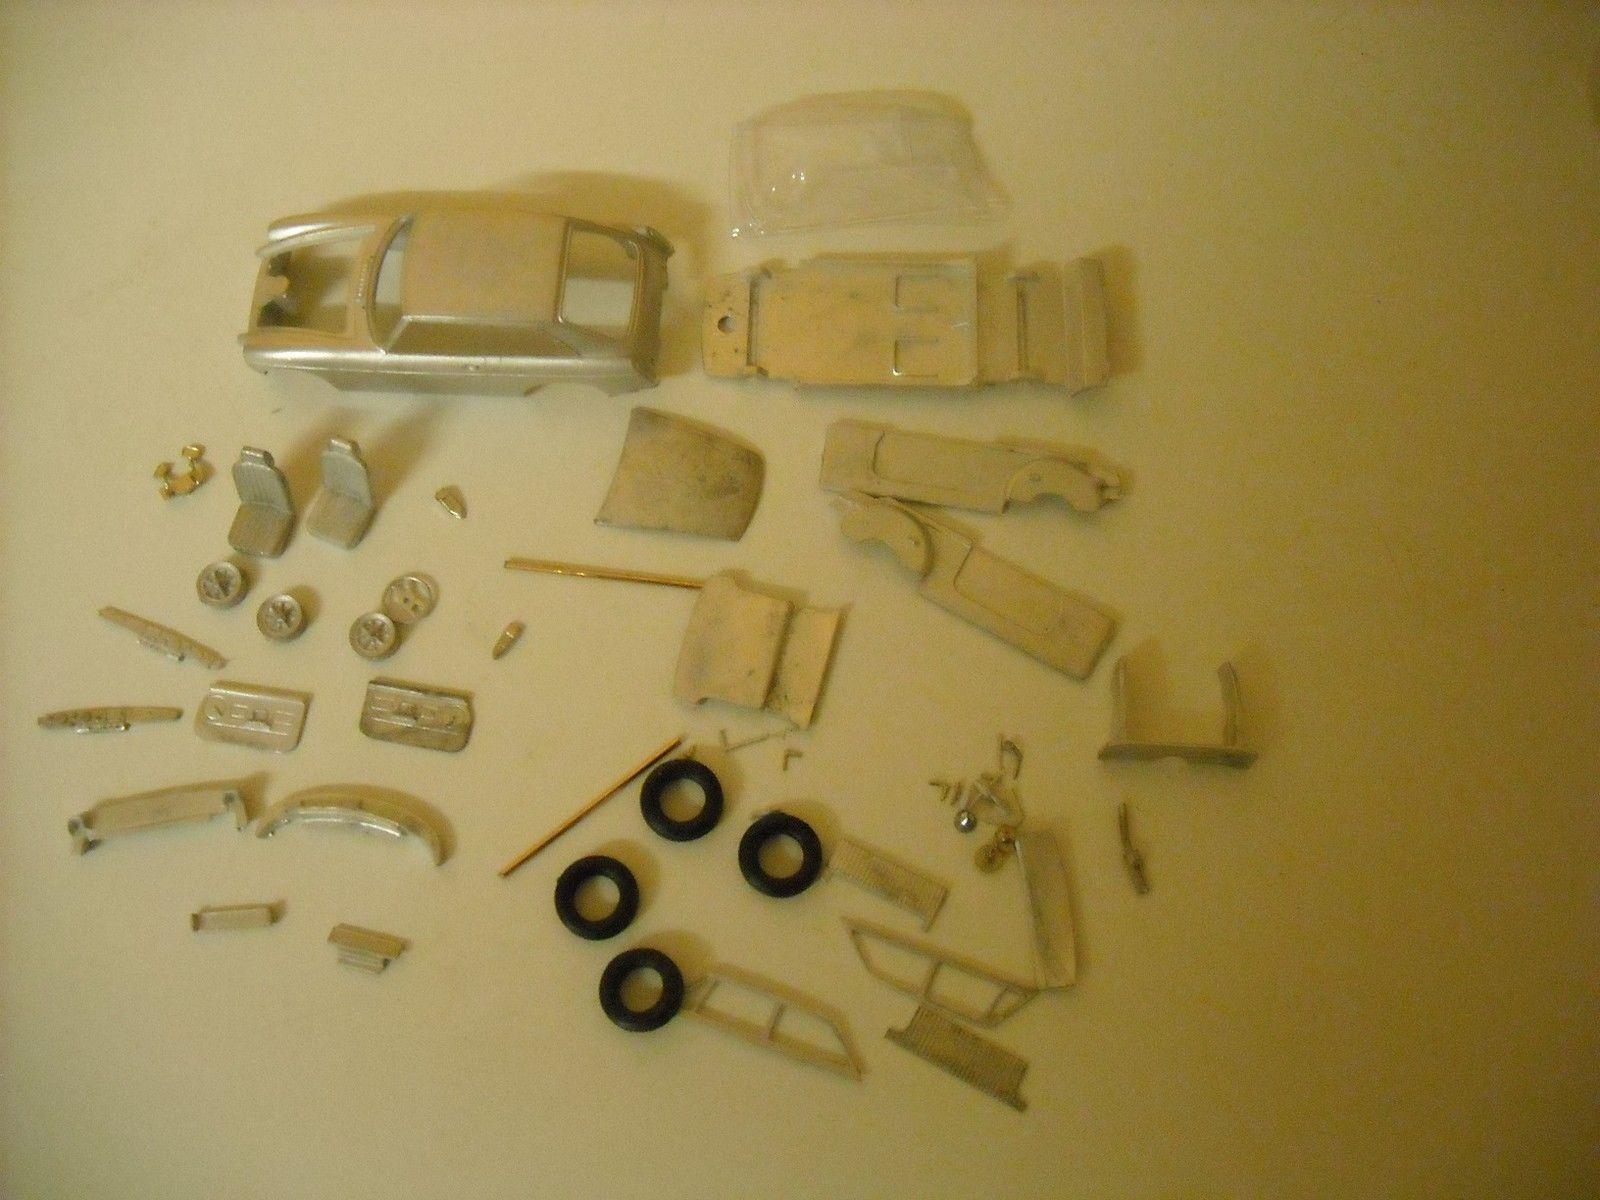 MGB GT Rubber Bumper 1 43rd scale white metal kit  by K & R Replicas